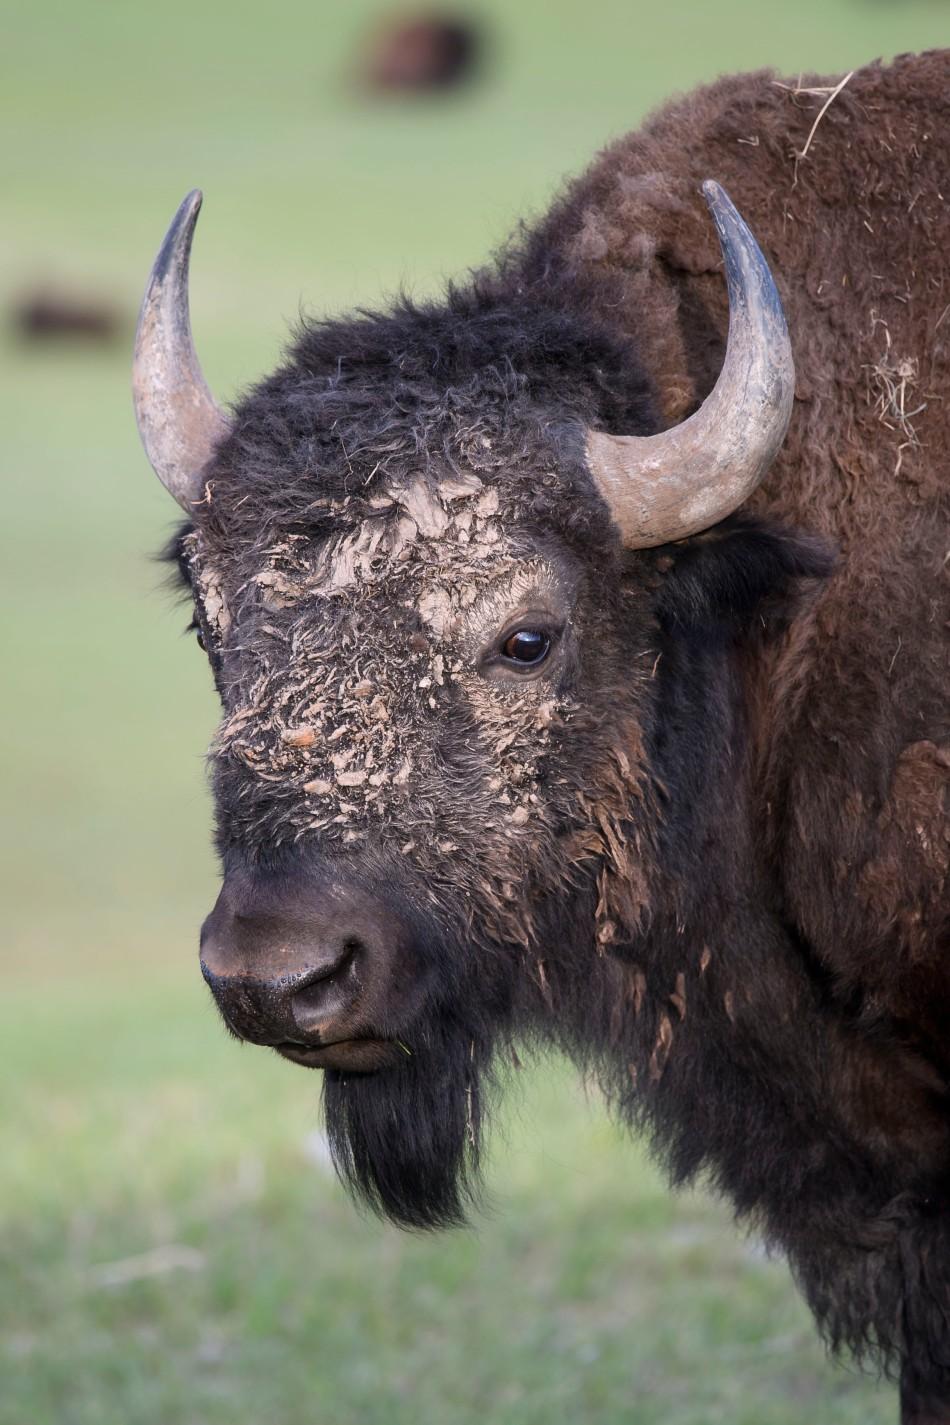 Muddy Bison Face